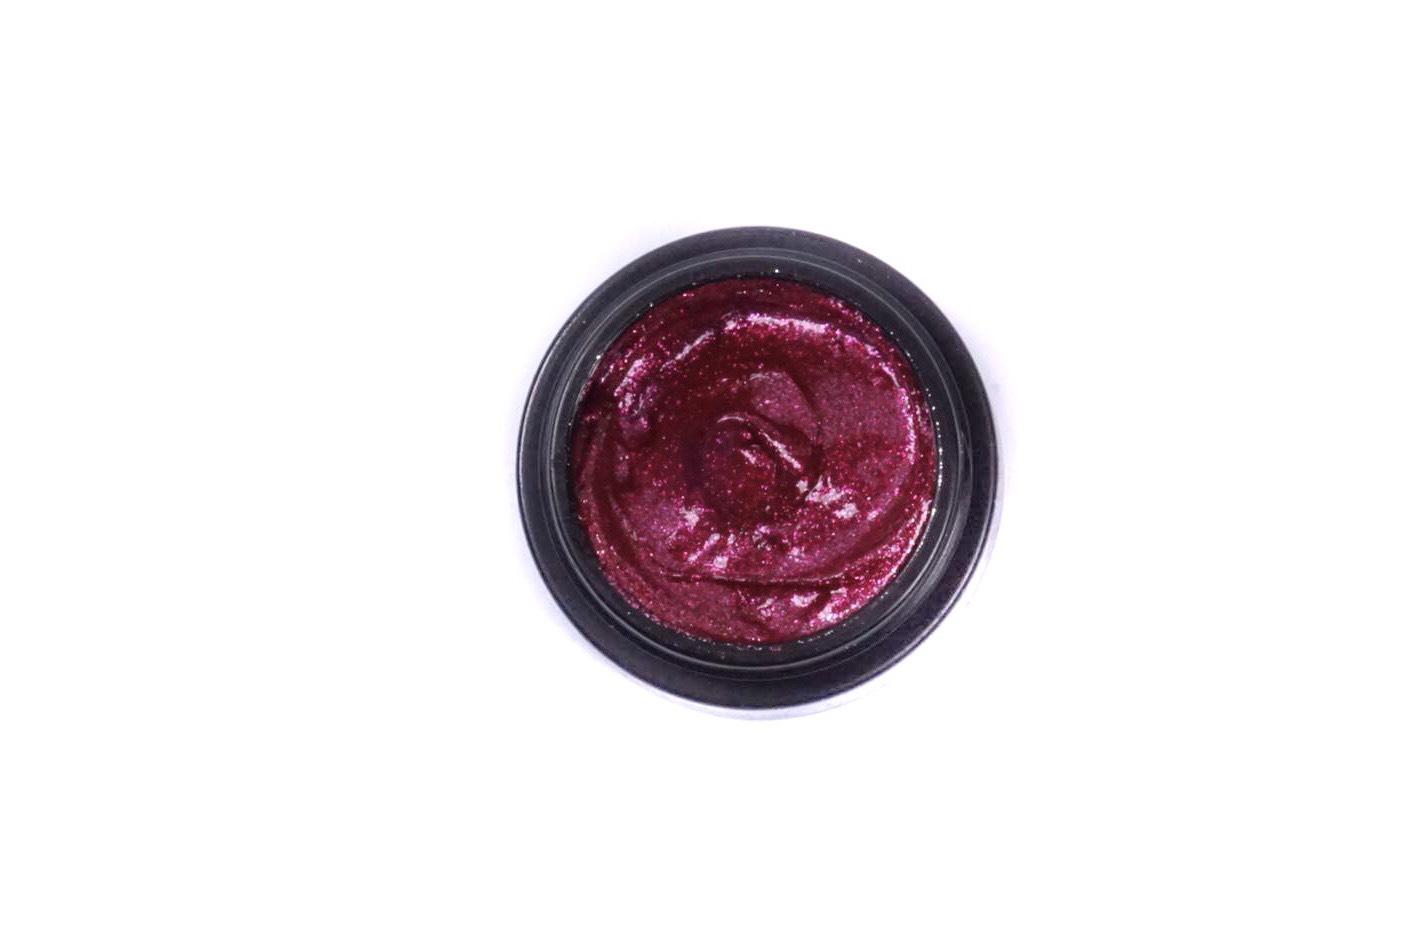 Scarlet glam